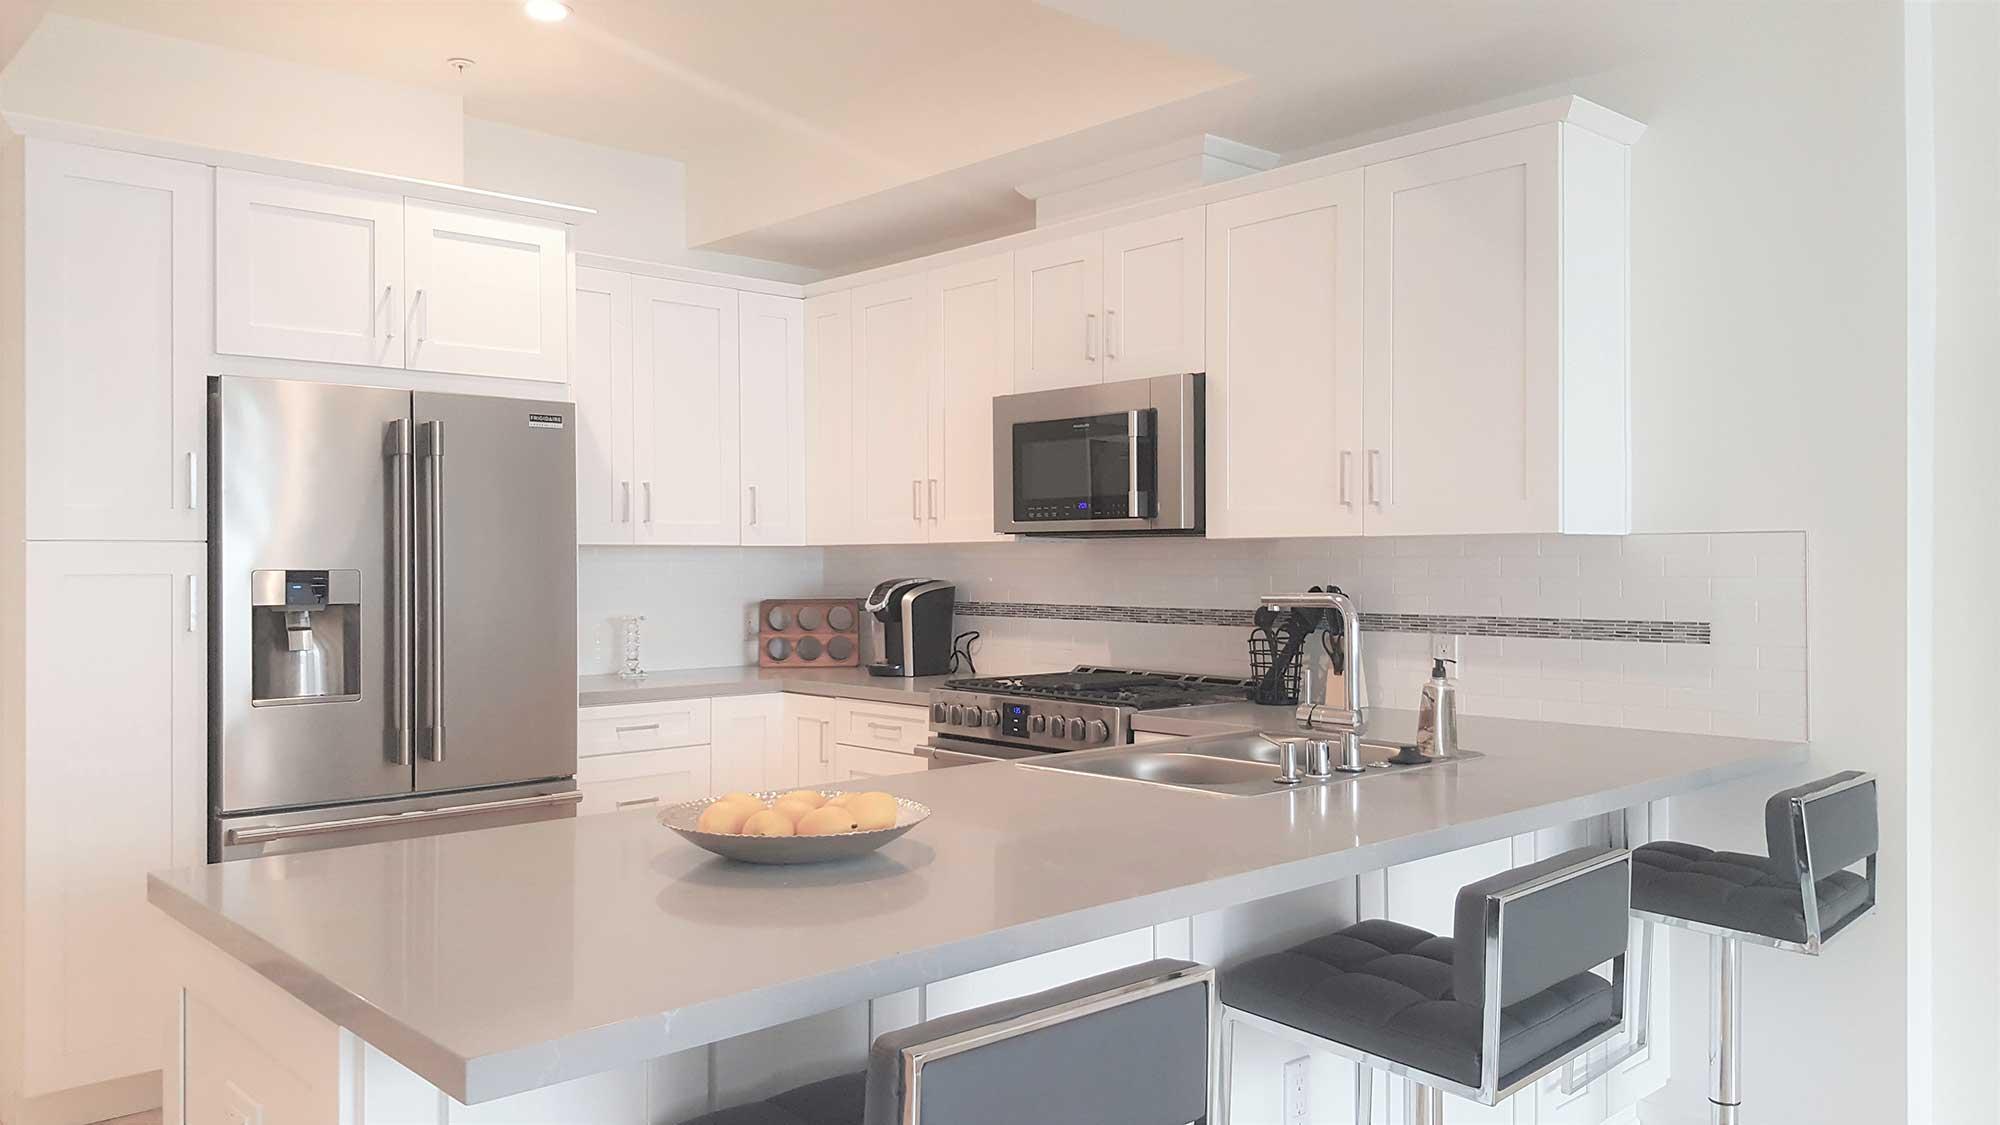 Apartment kitchen interior